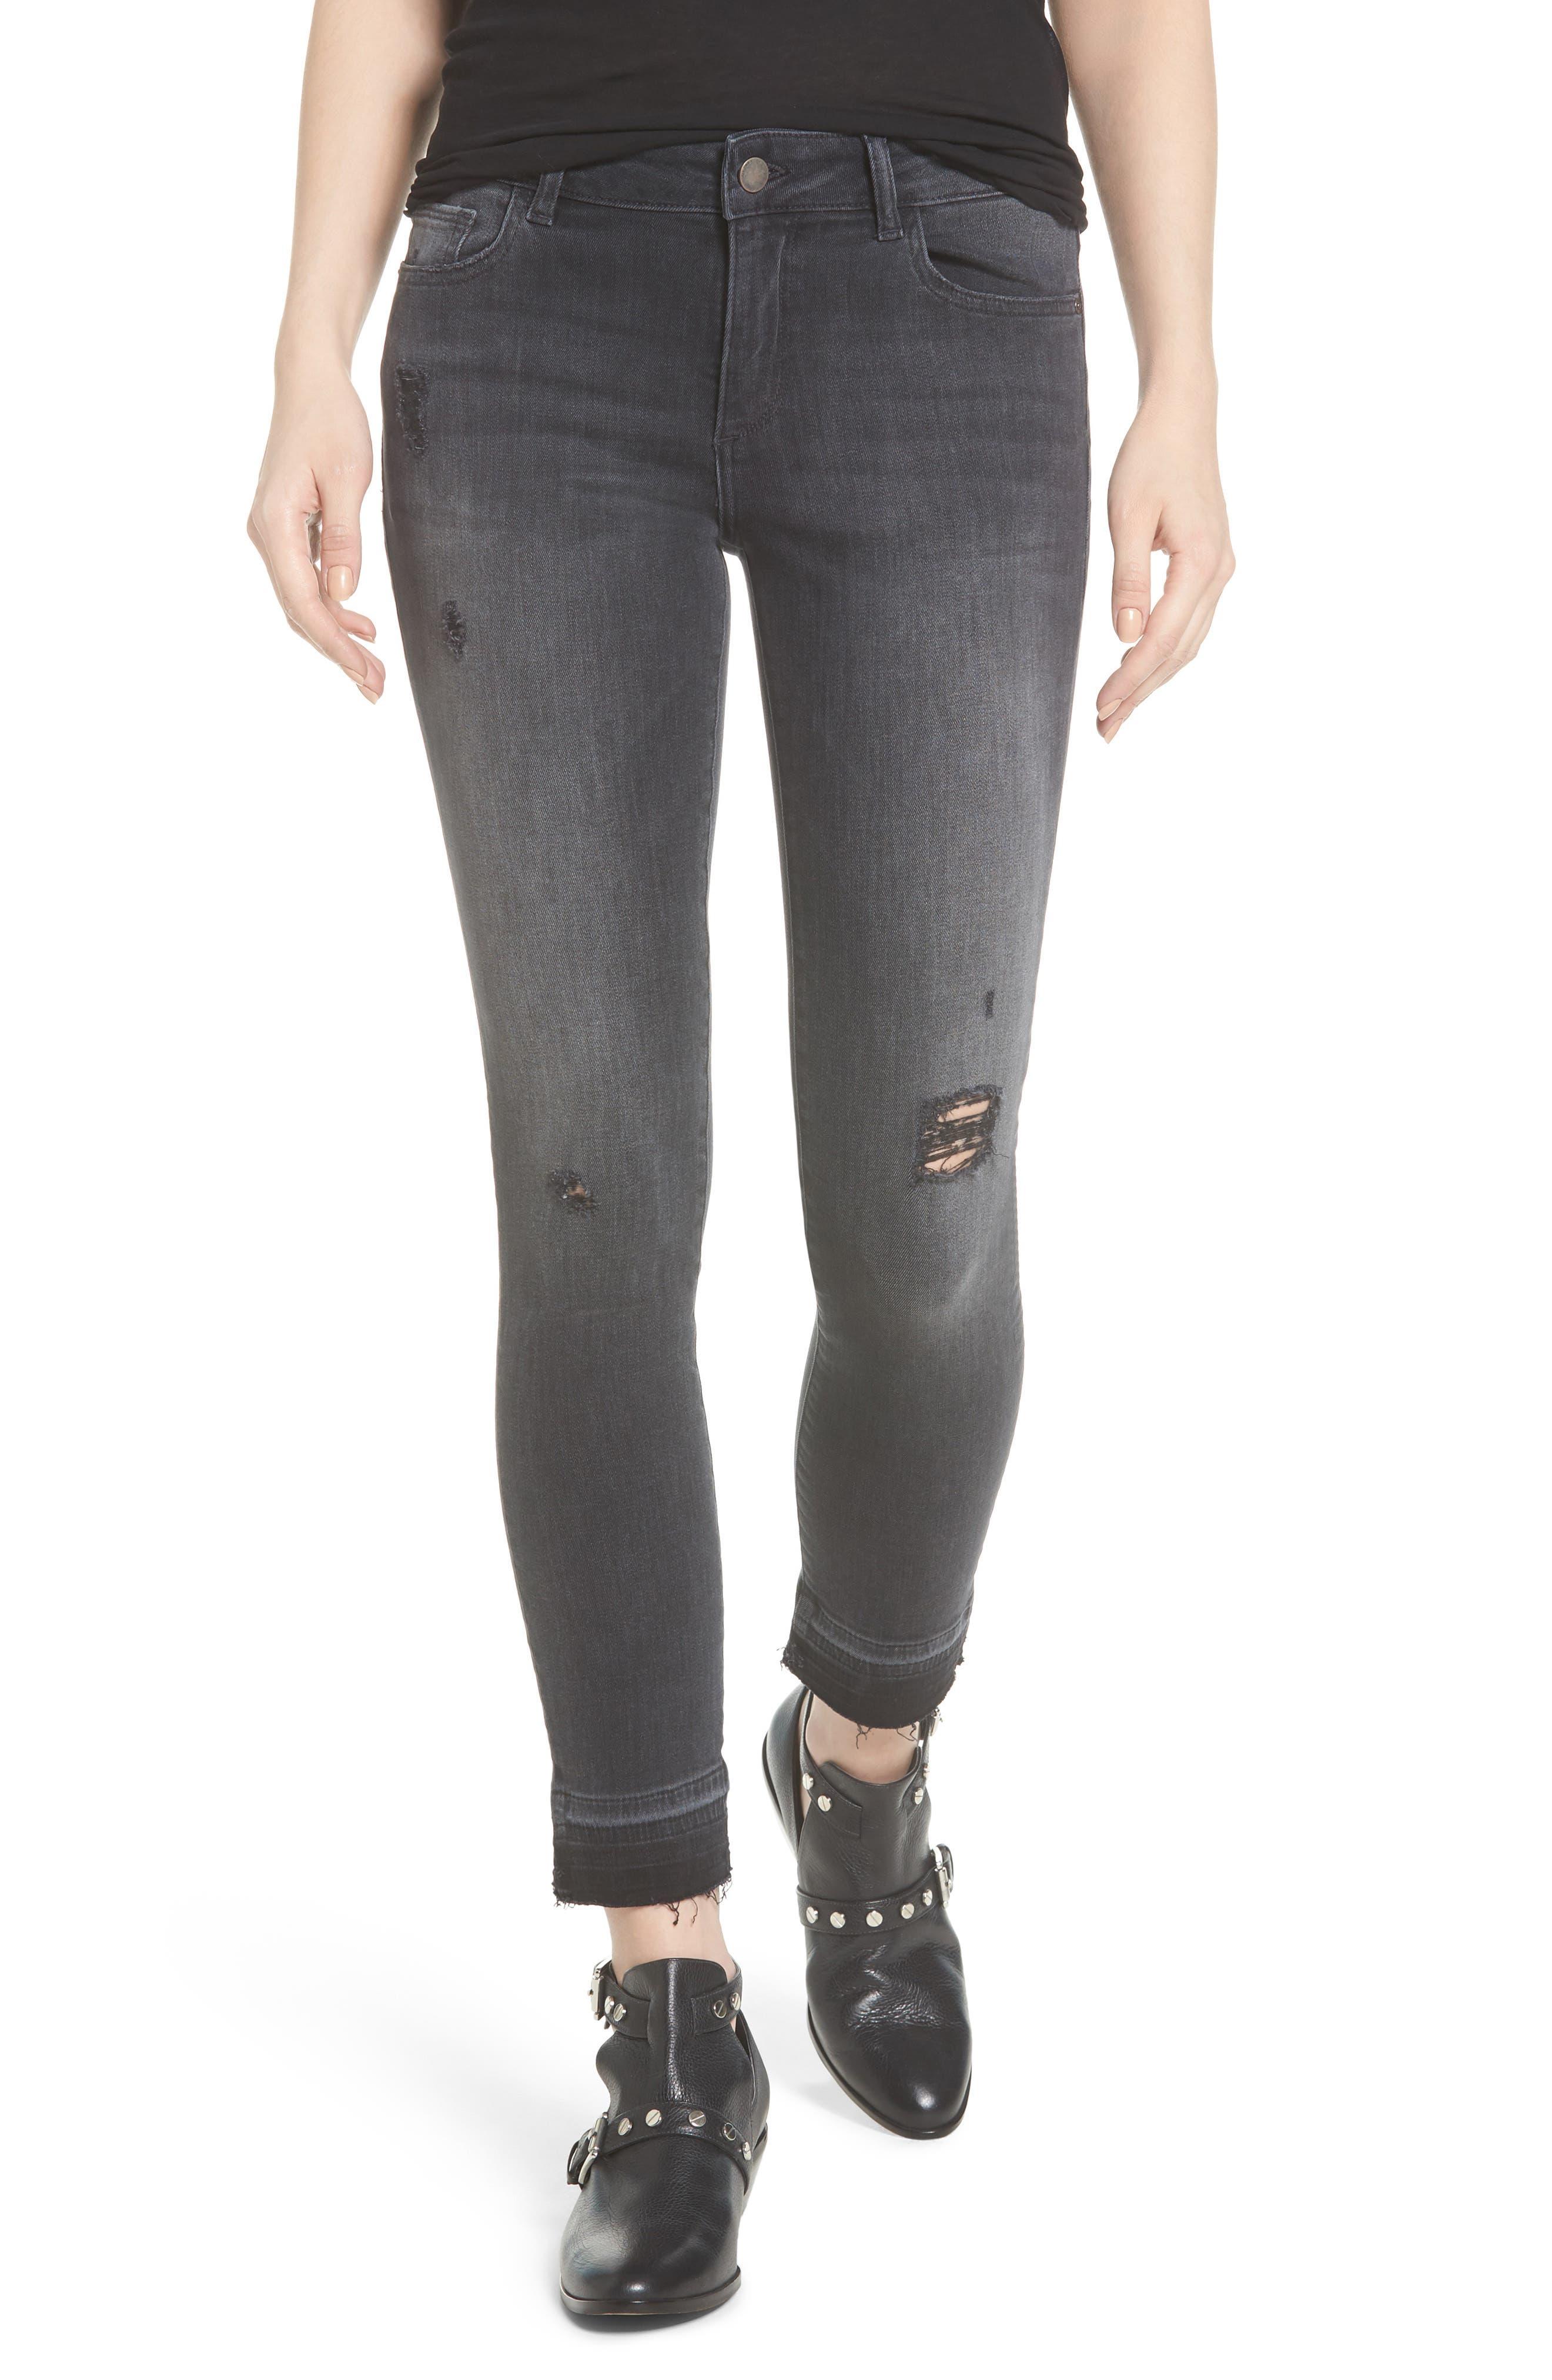 Emma Power Legging Jeans,                         Main,                         color,